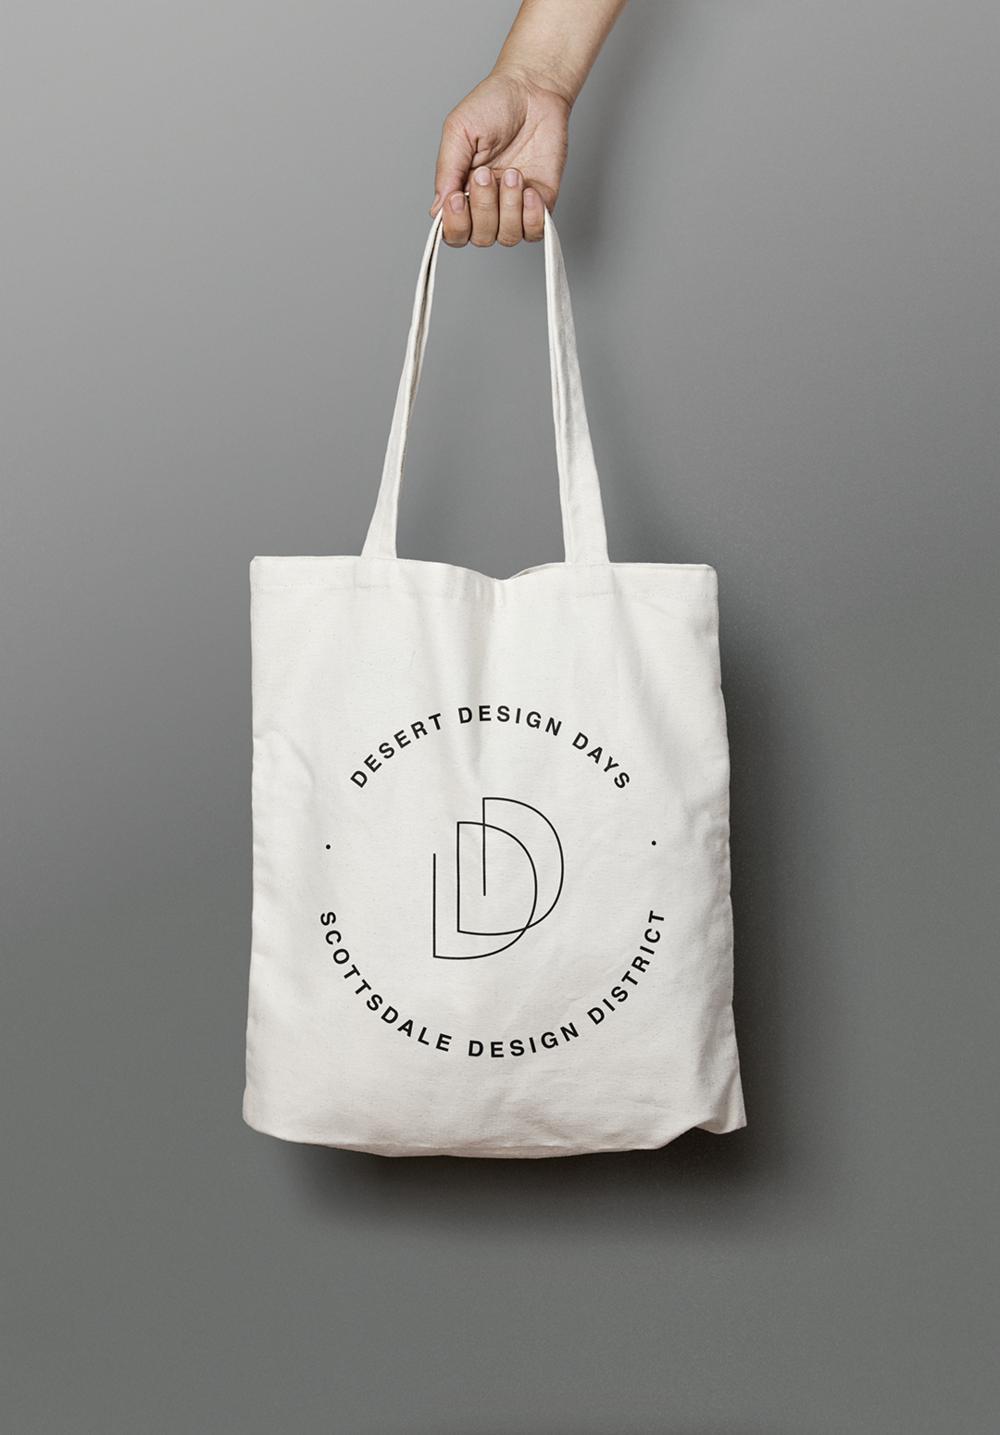 desert-design-days-tote.png